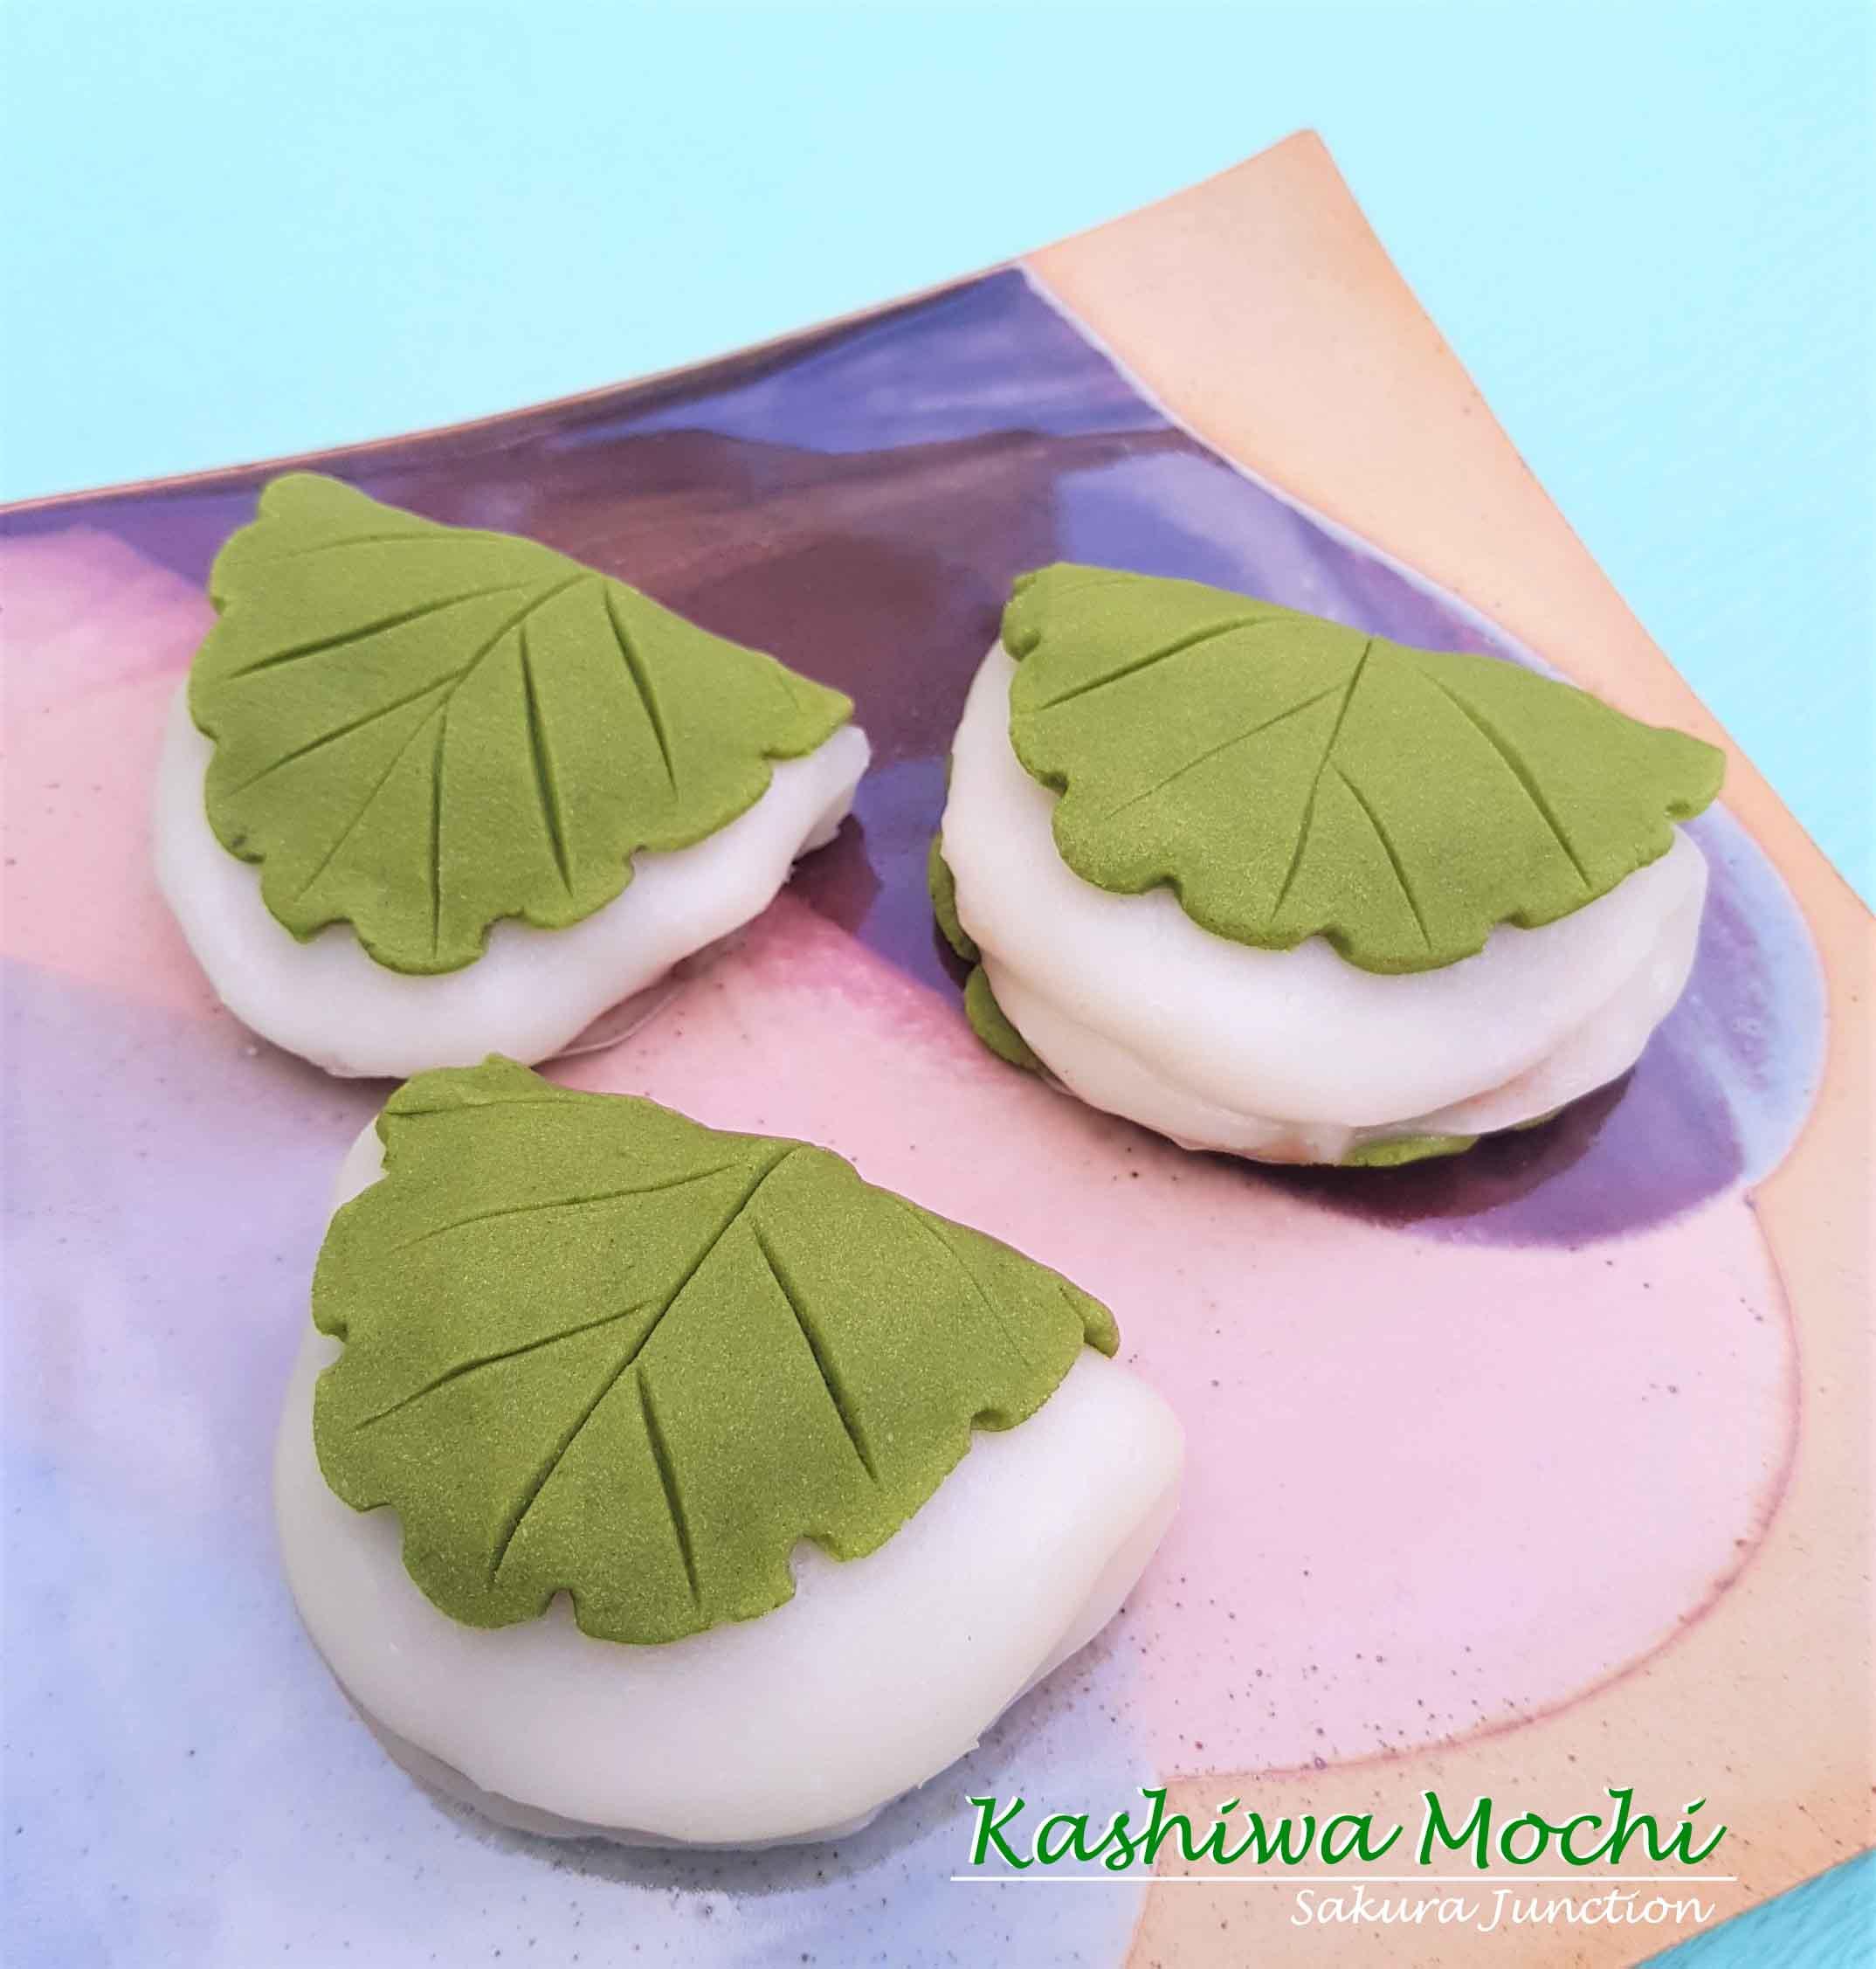 KashiwaMochi1